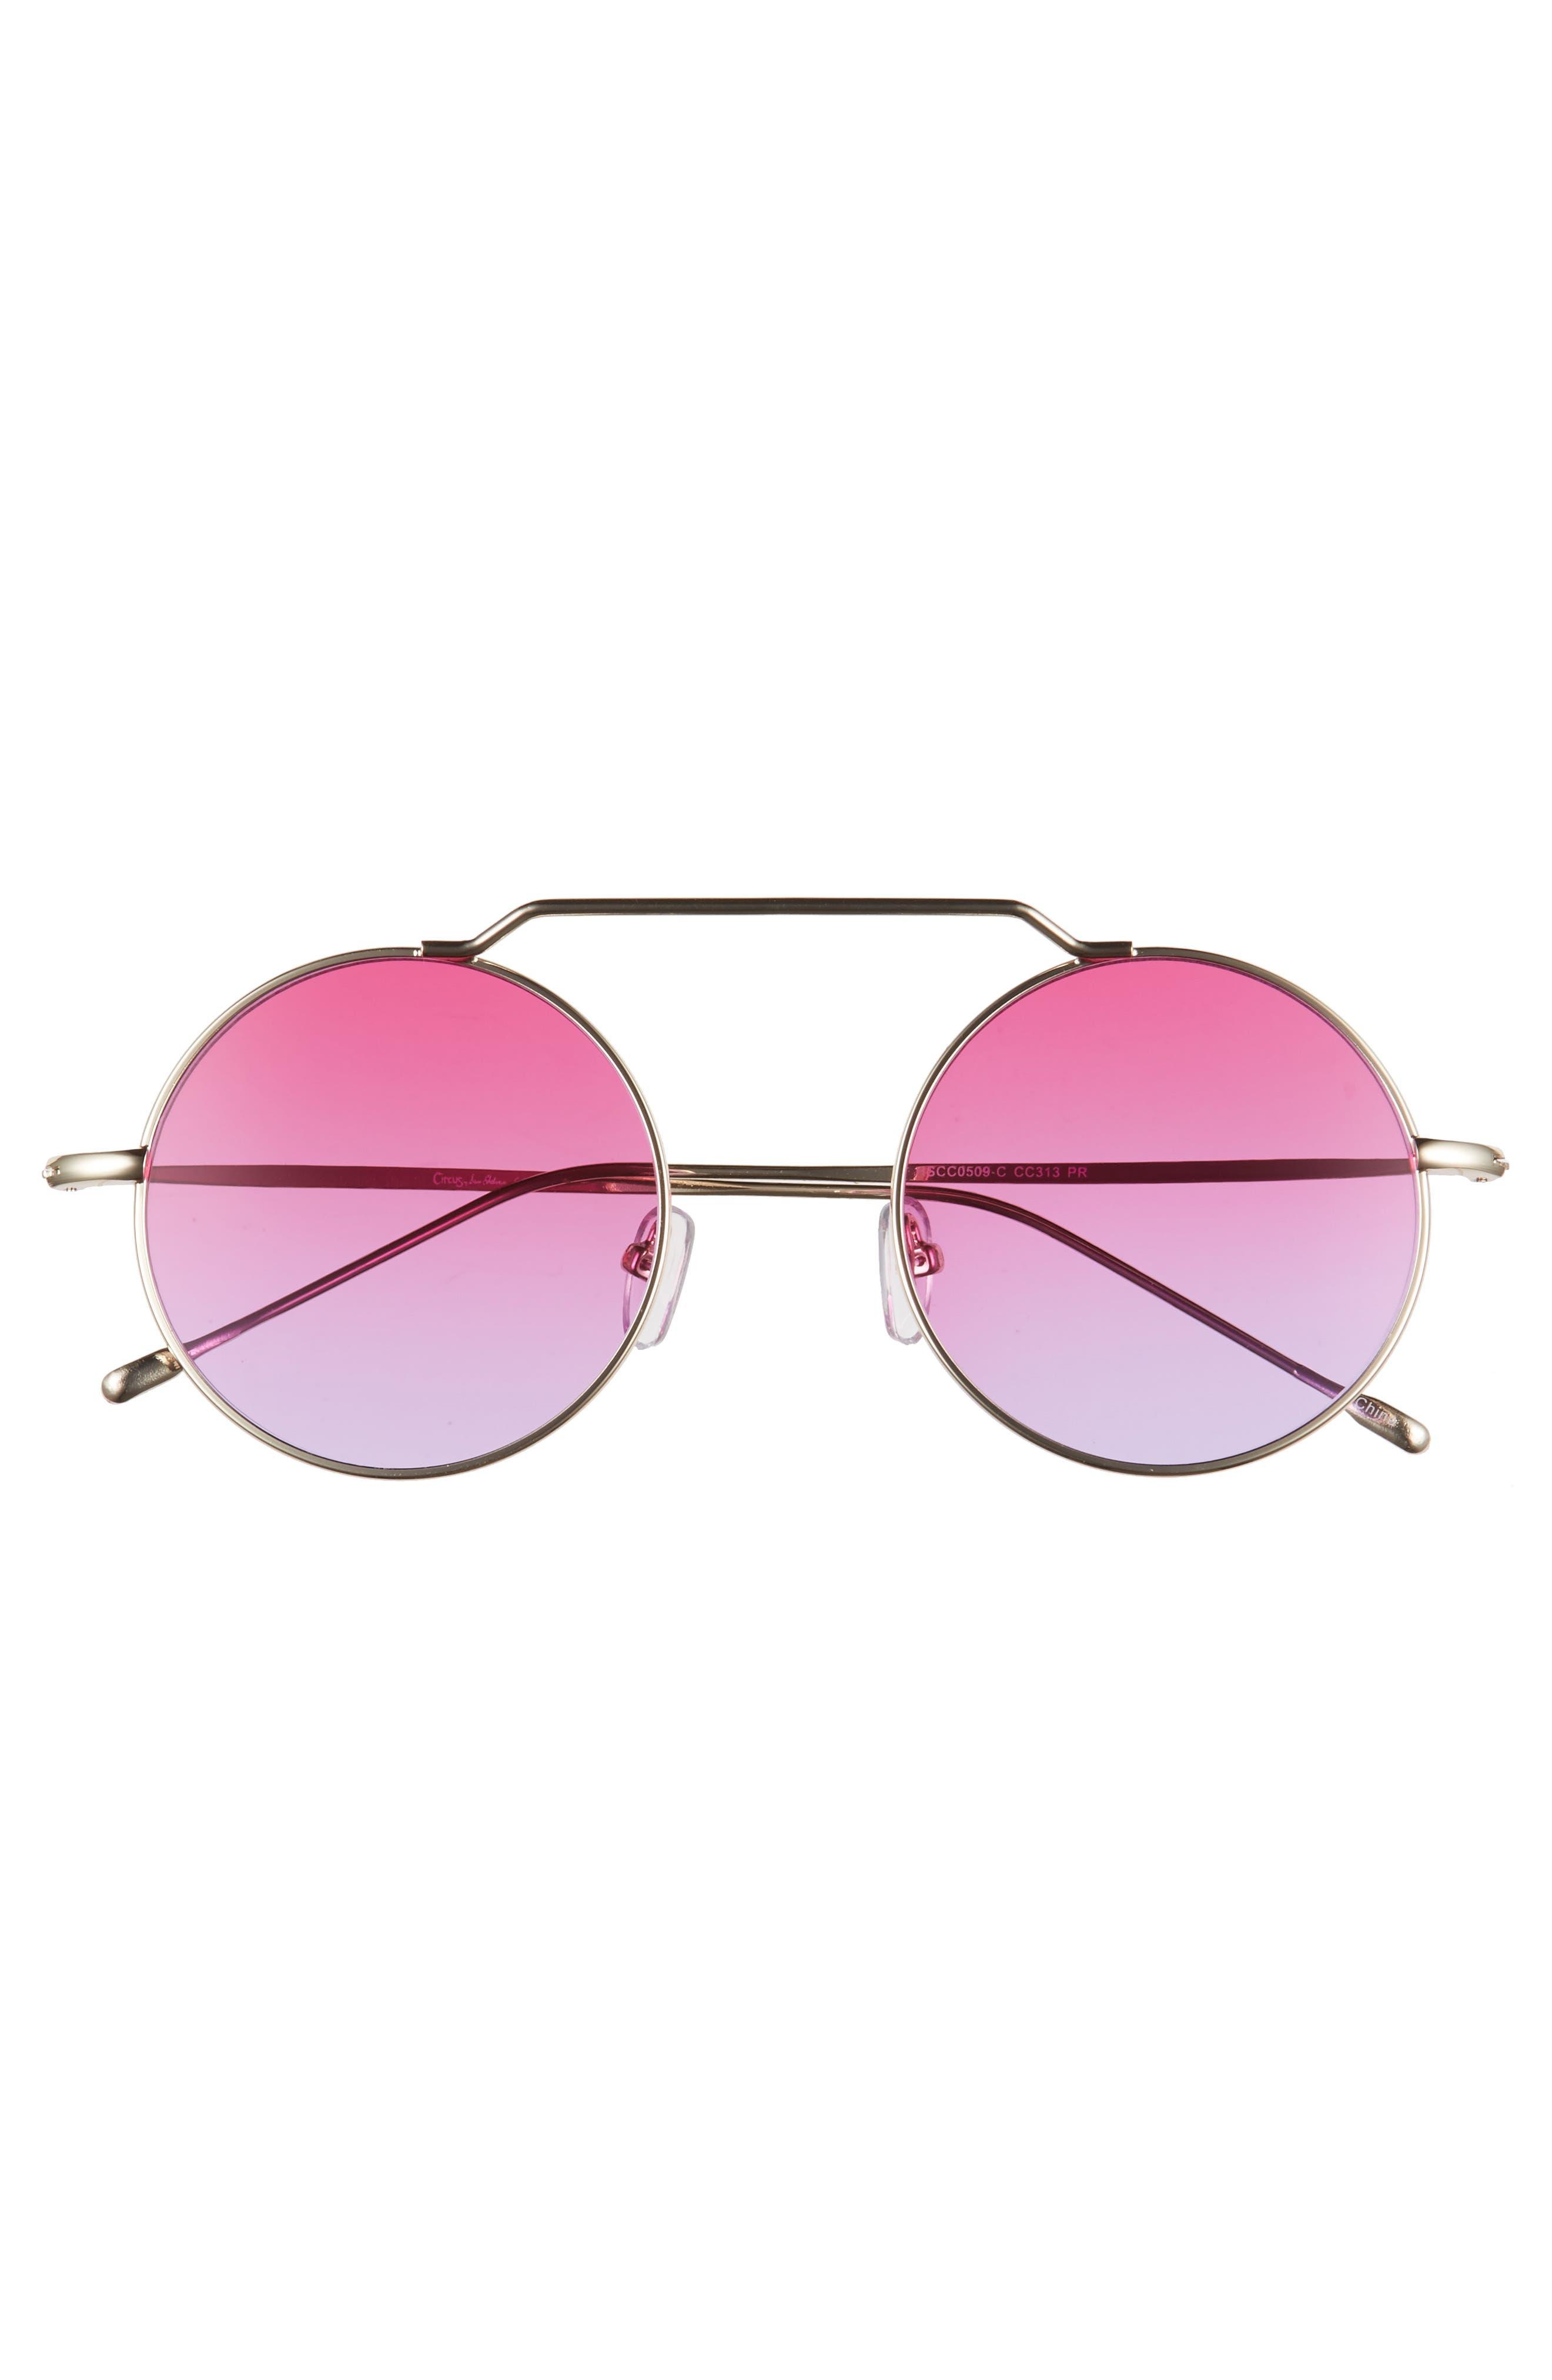 51mm Brow Bar Round Sunglasses,                             Alternate thumbnail 3, color,                             Purple